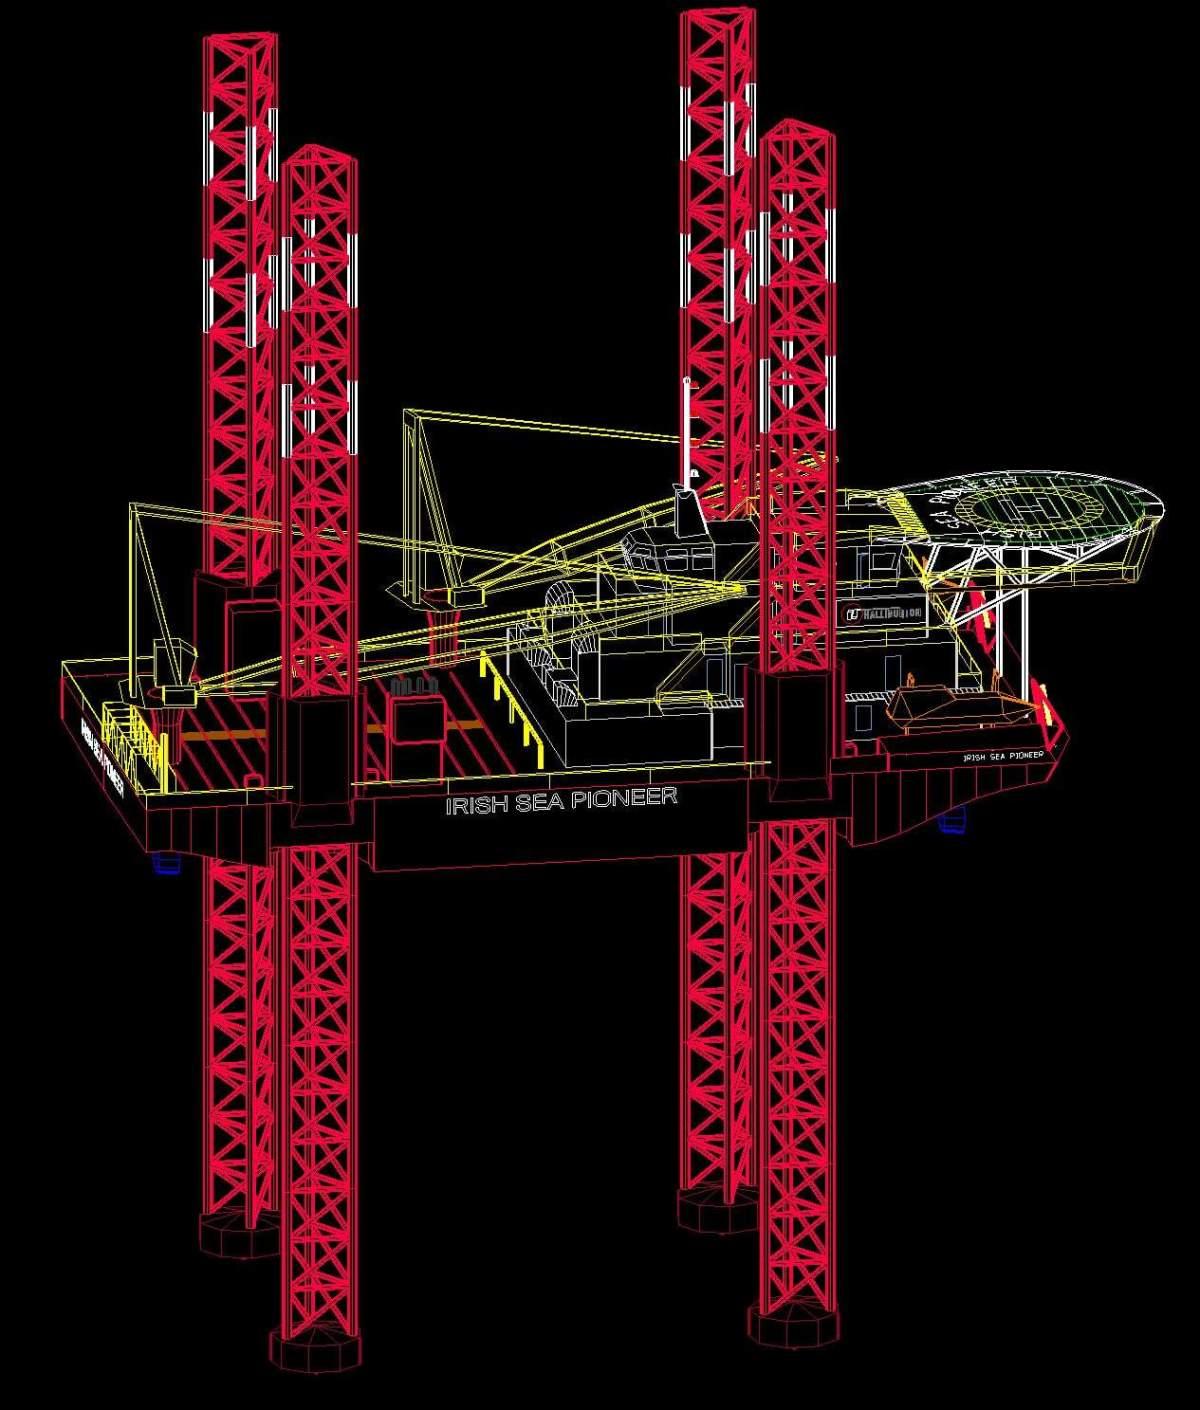 Finite element model of  jack-up Irish Sea Pioneer